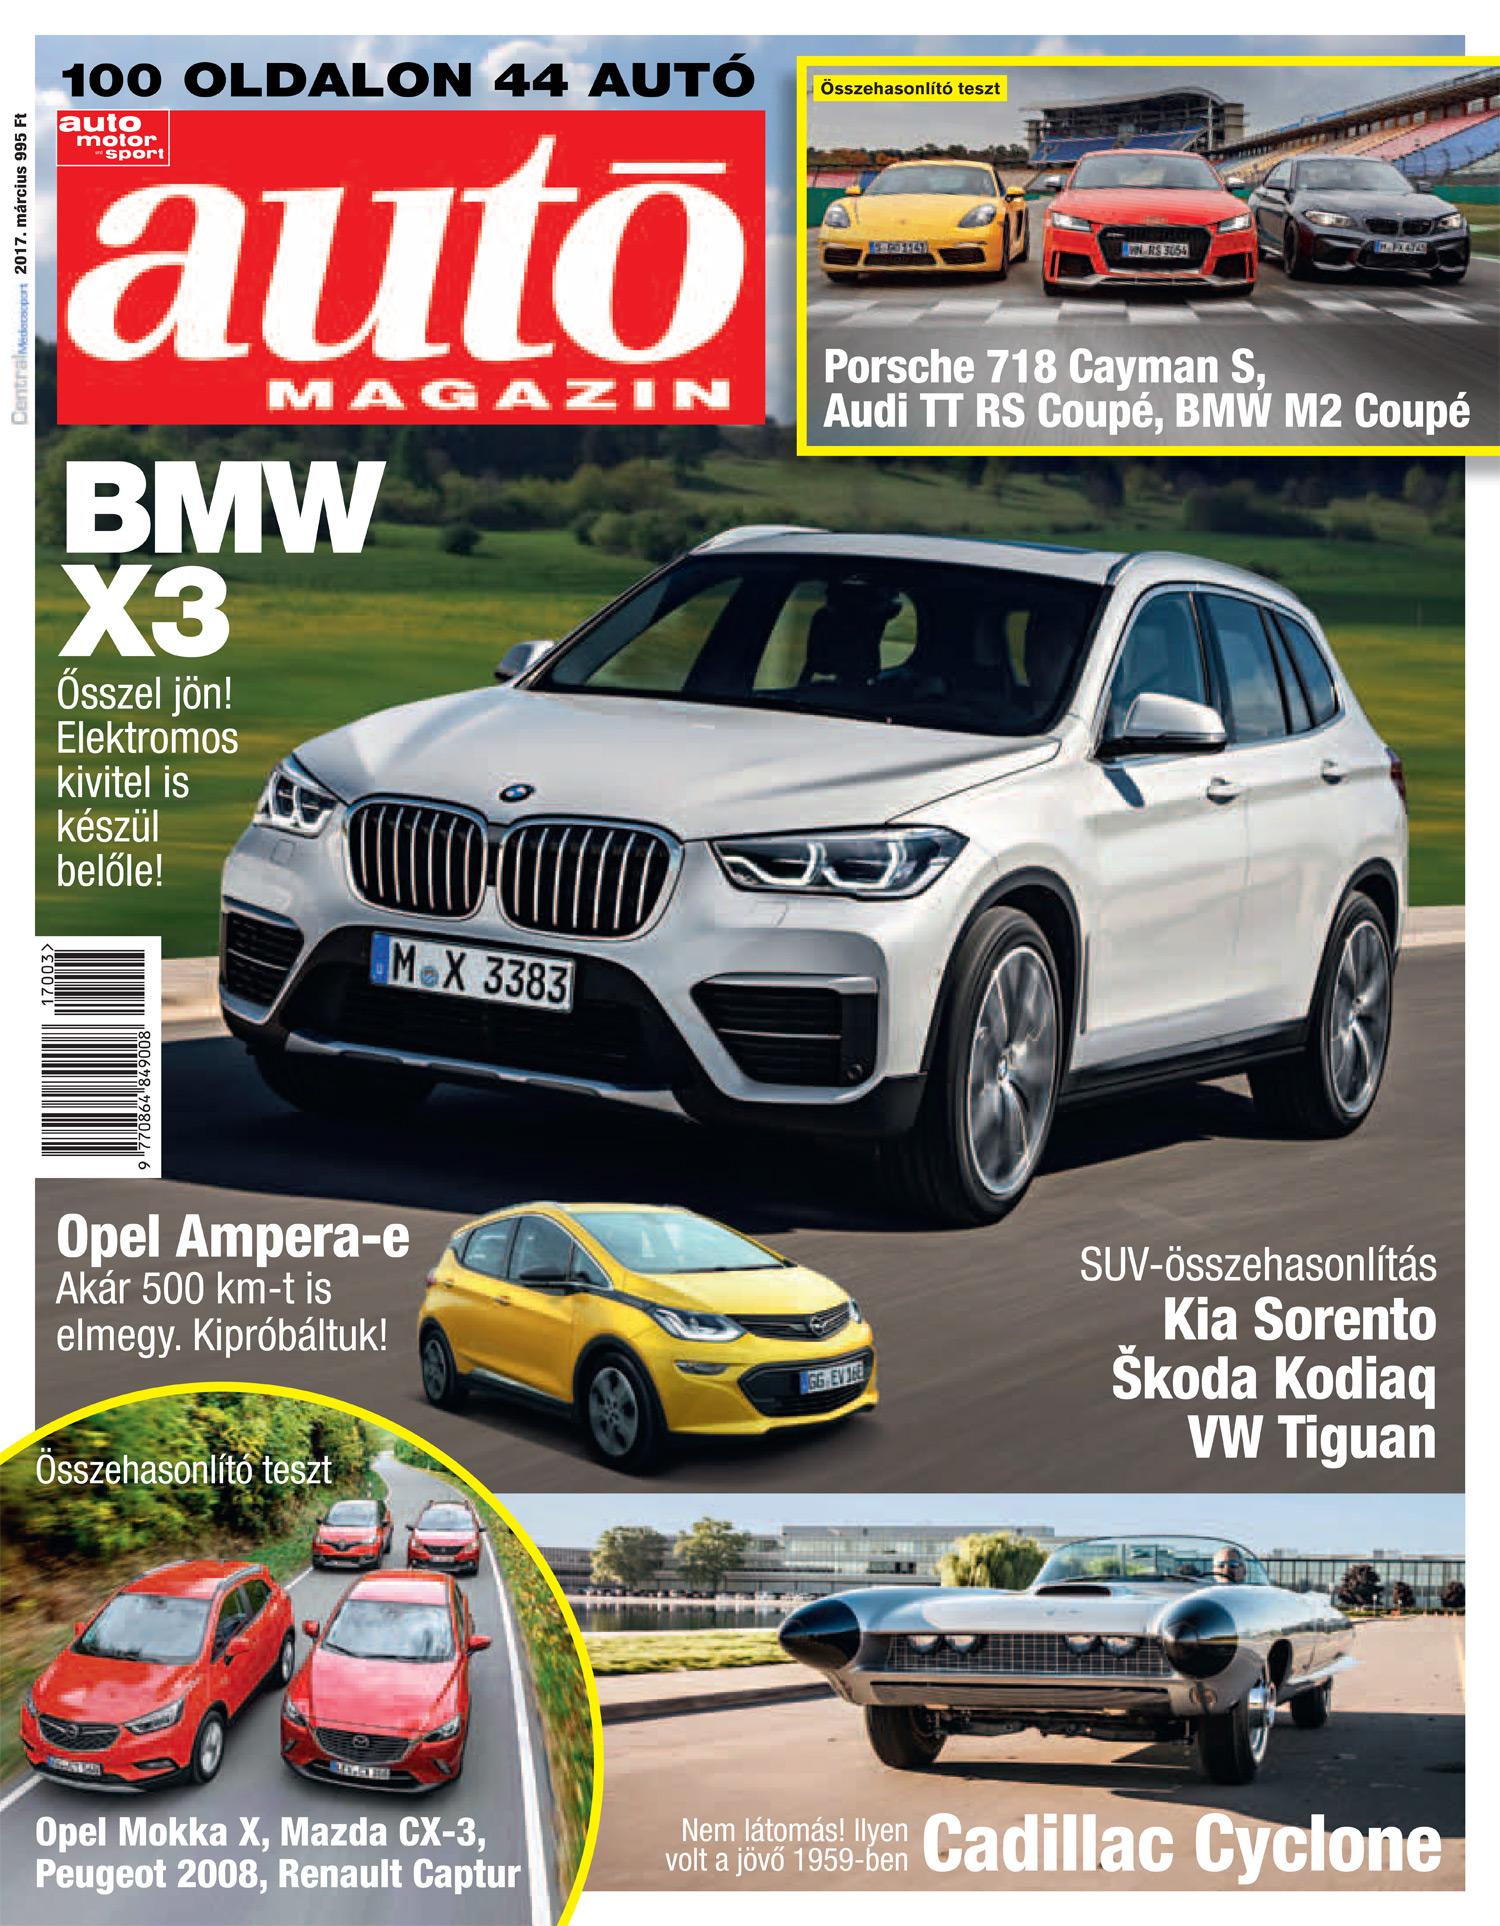 BMWx3_AM